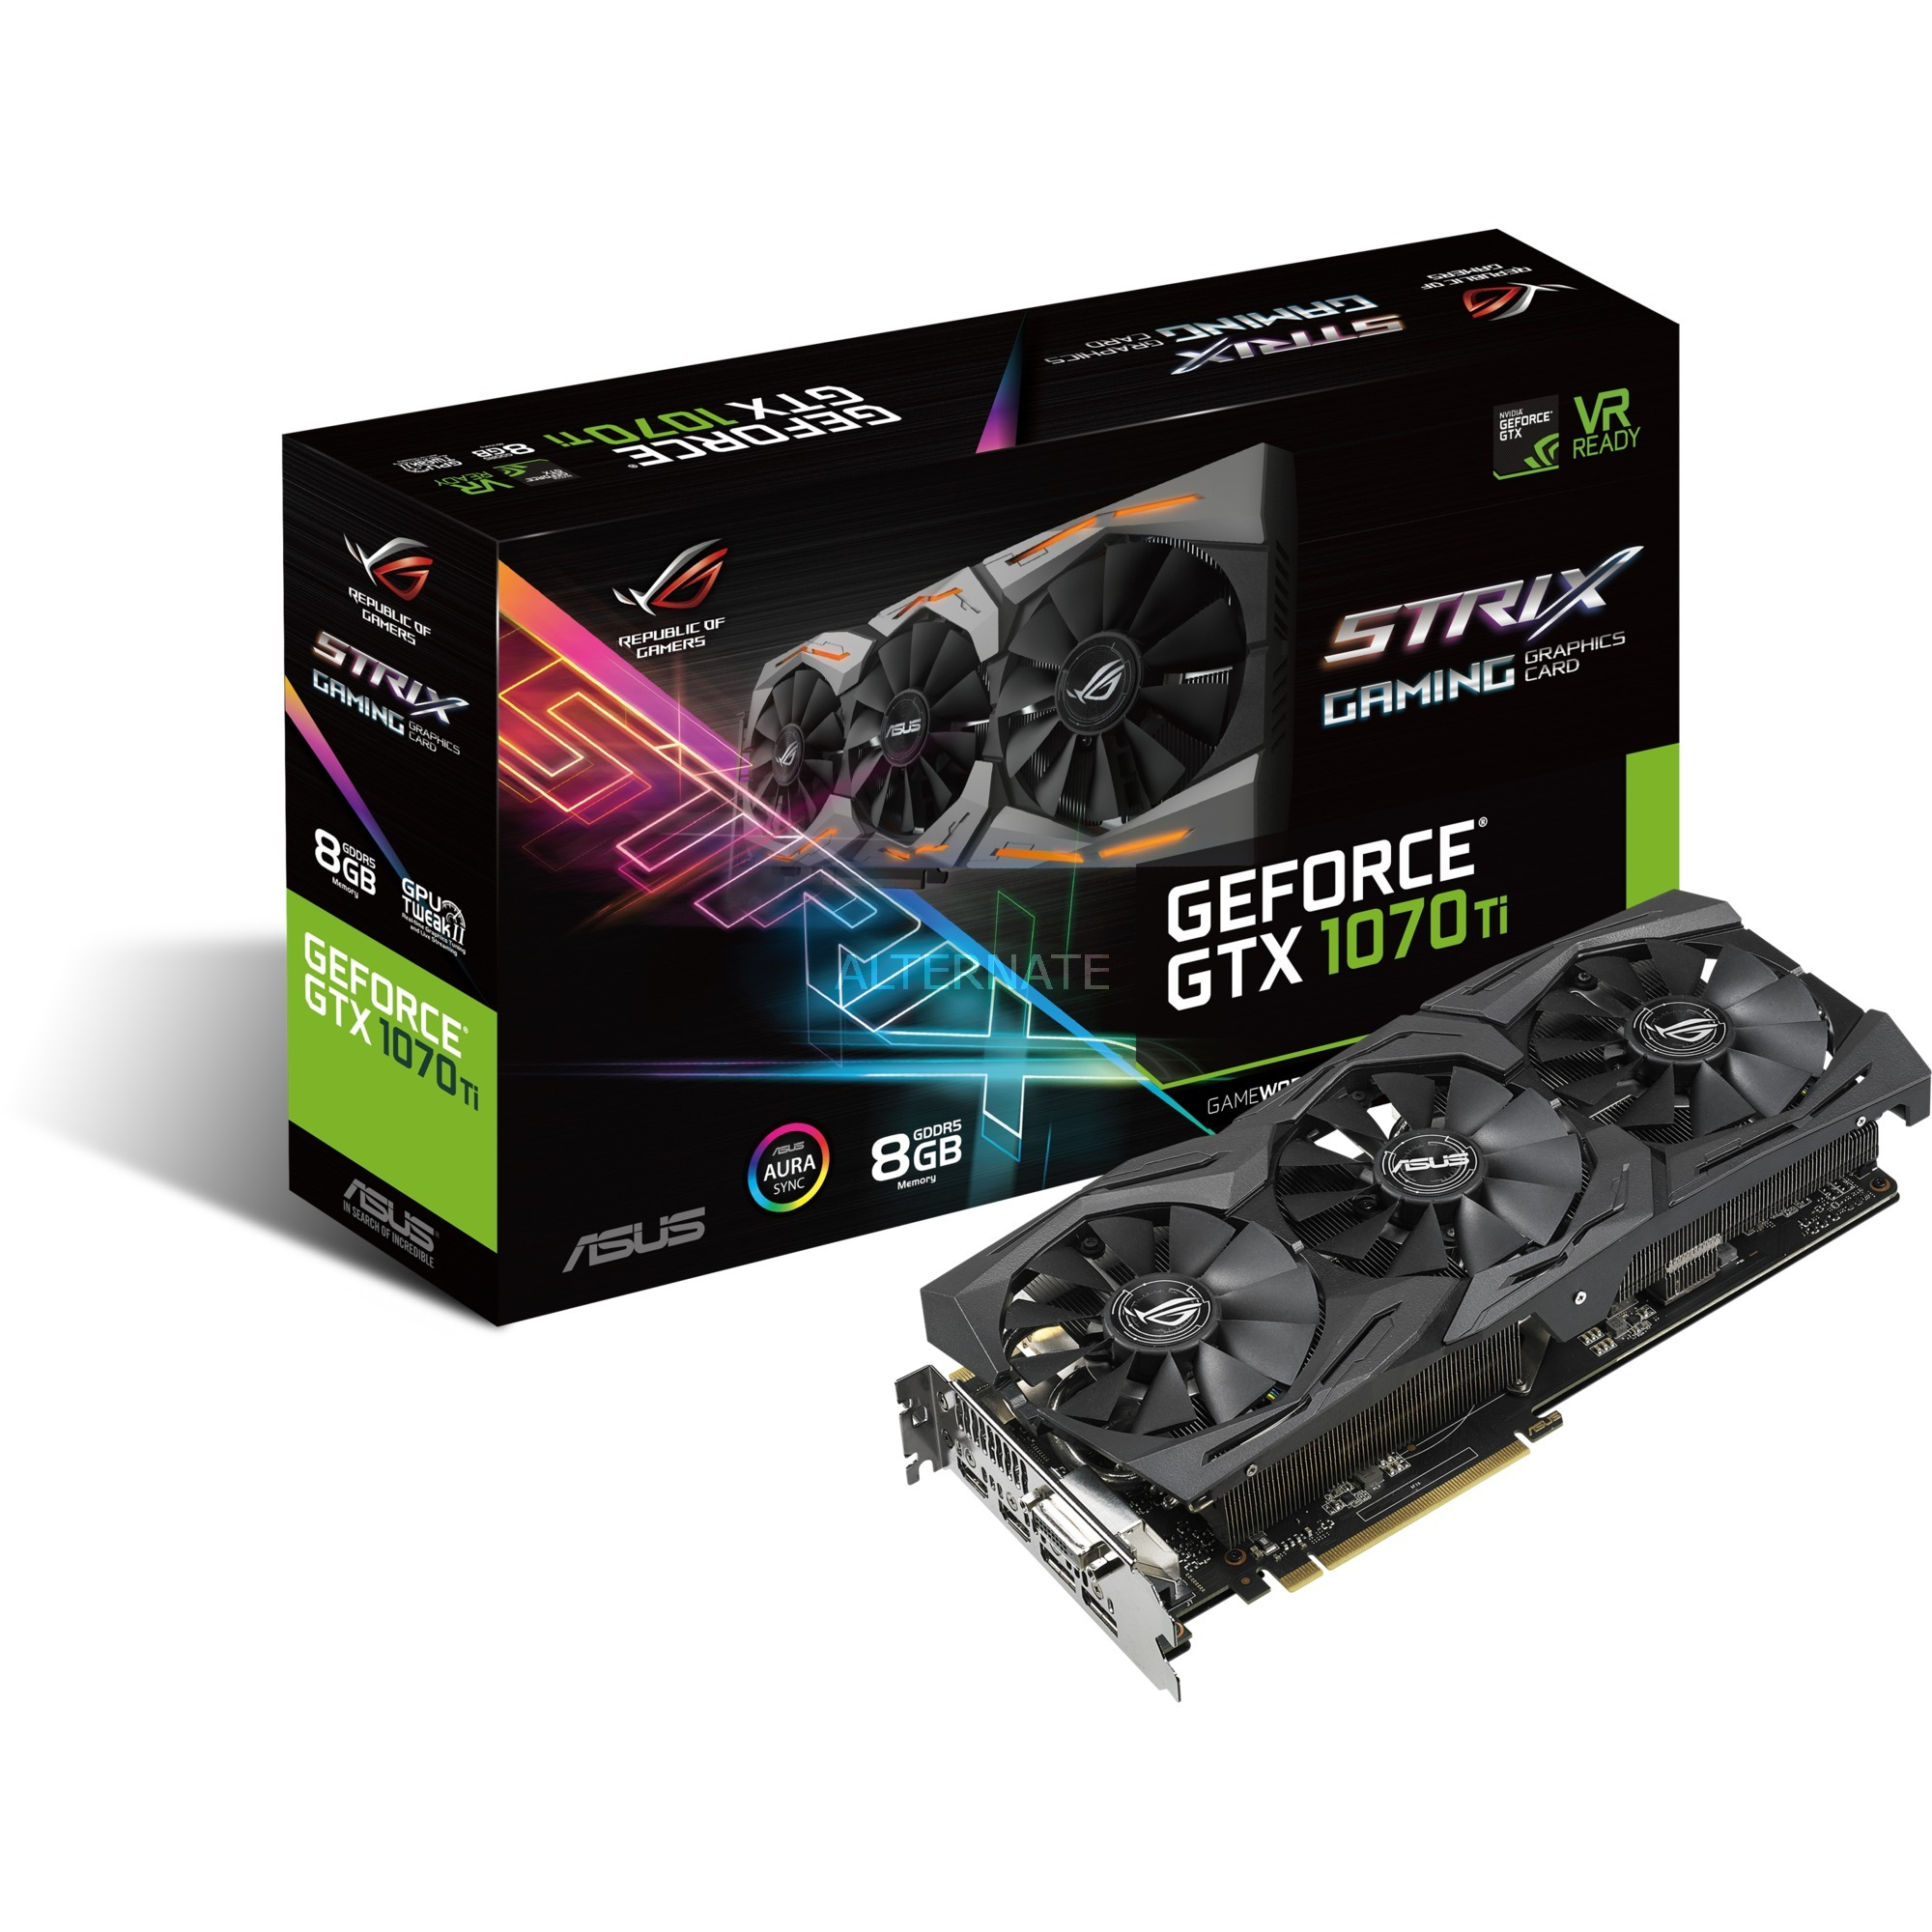 ROG GeForce GTX 1070 Strix Gaming 8G, Carte graphique